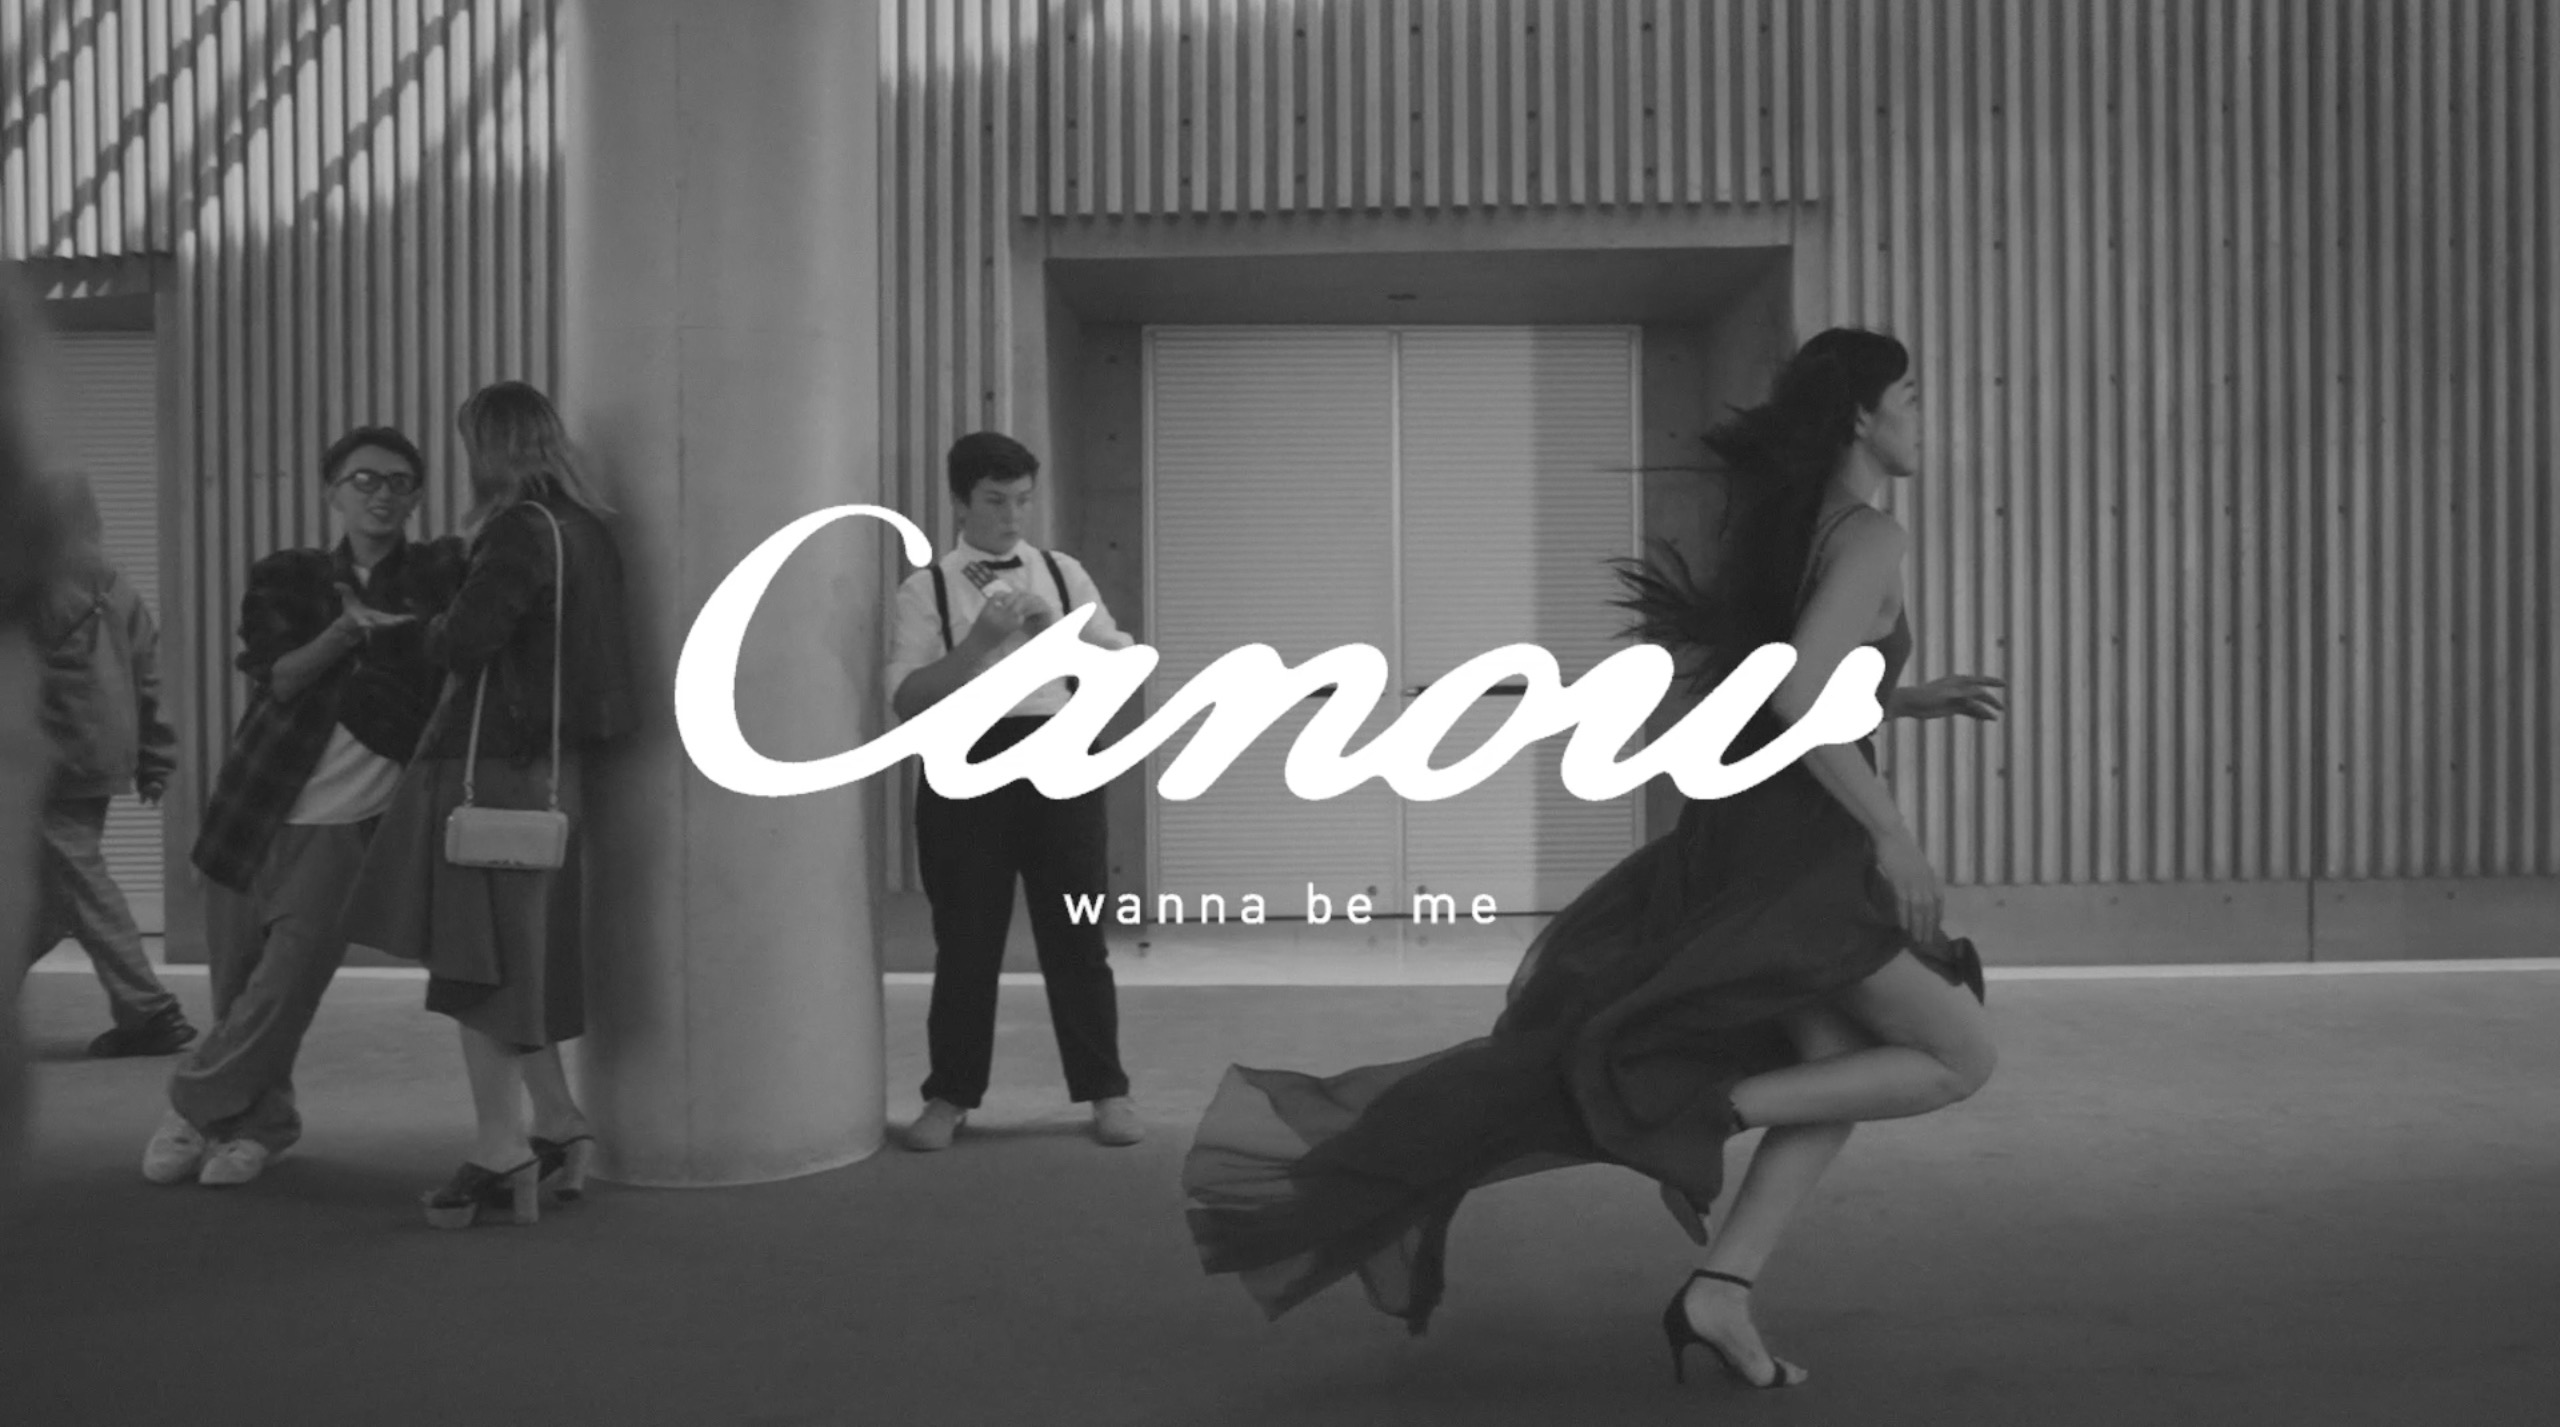 CLARITY WEBSTOREが装いも新たにCanow Online Storeとして再誕生しました